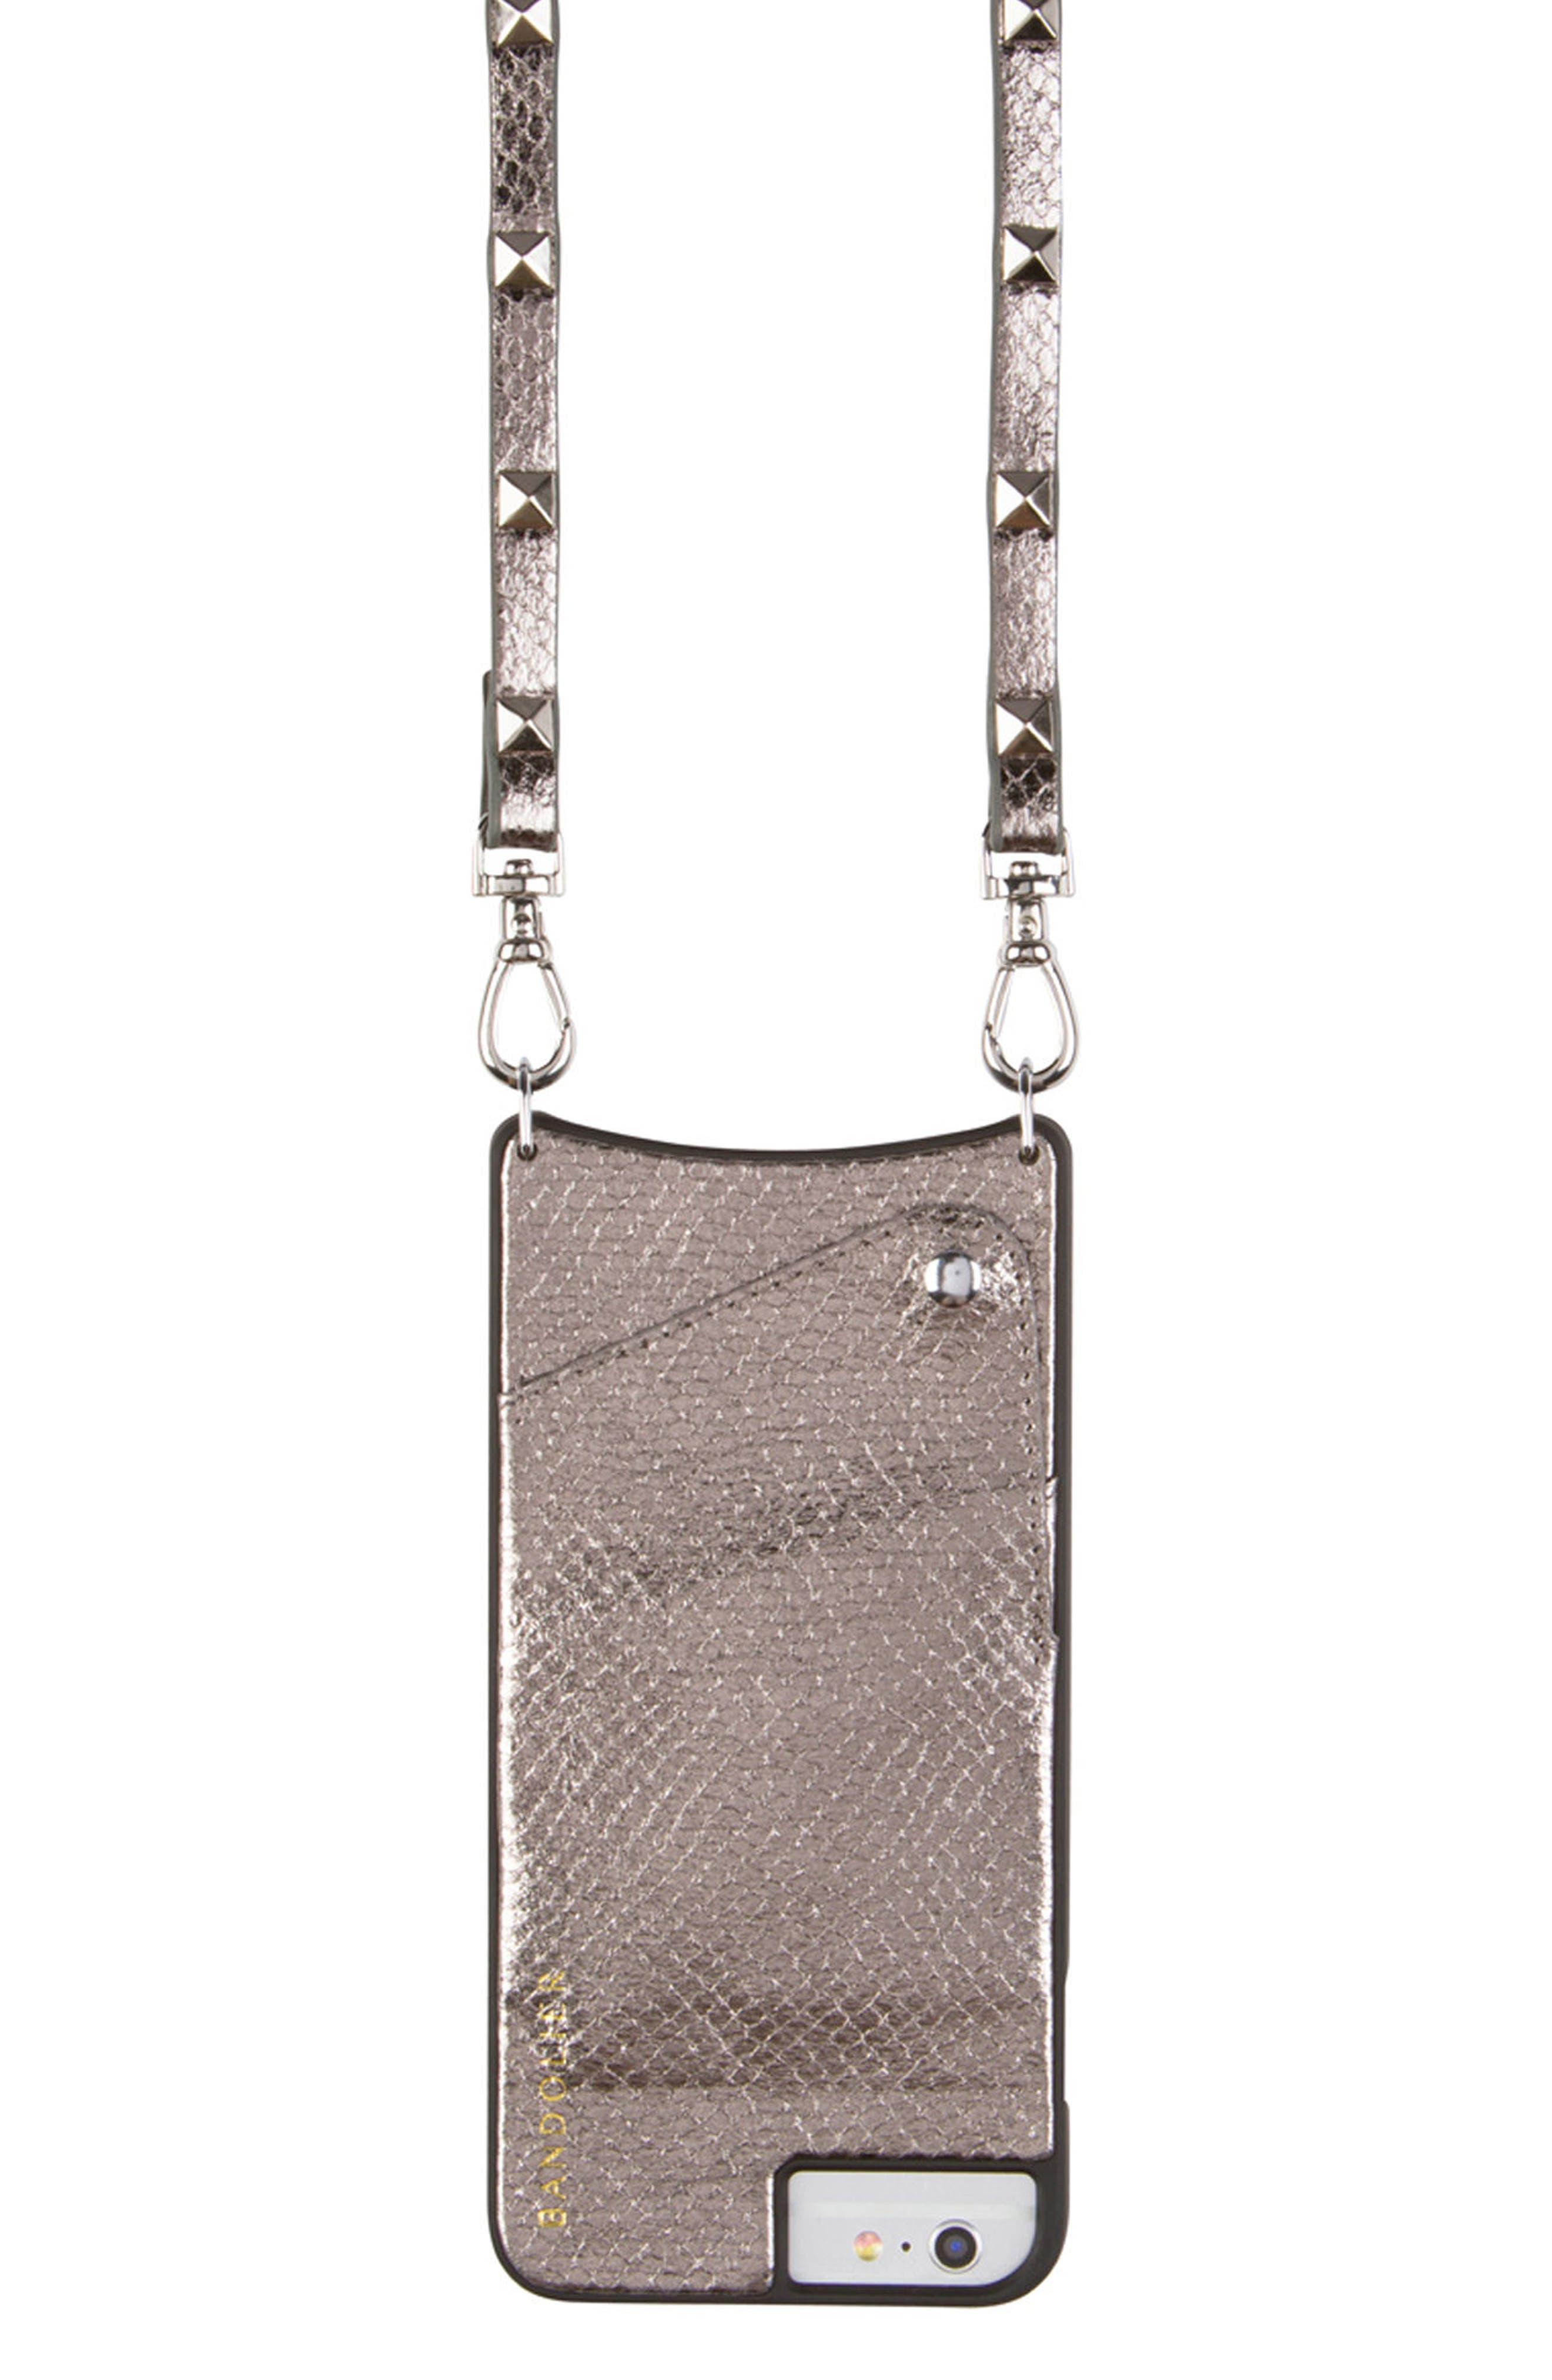 Sarah Metallic Faux Snakeskin iPhone 6/7/8 & 6/7/8 Plus Crossbody Case,                             Main thumbnail 1, color,                             PEWTER/ SILVER